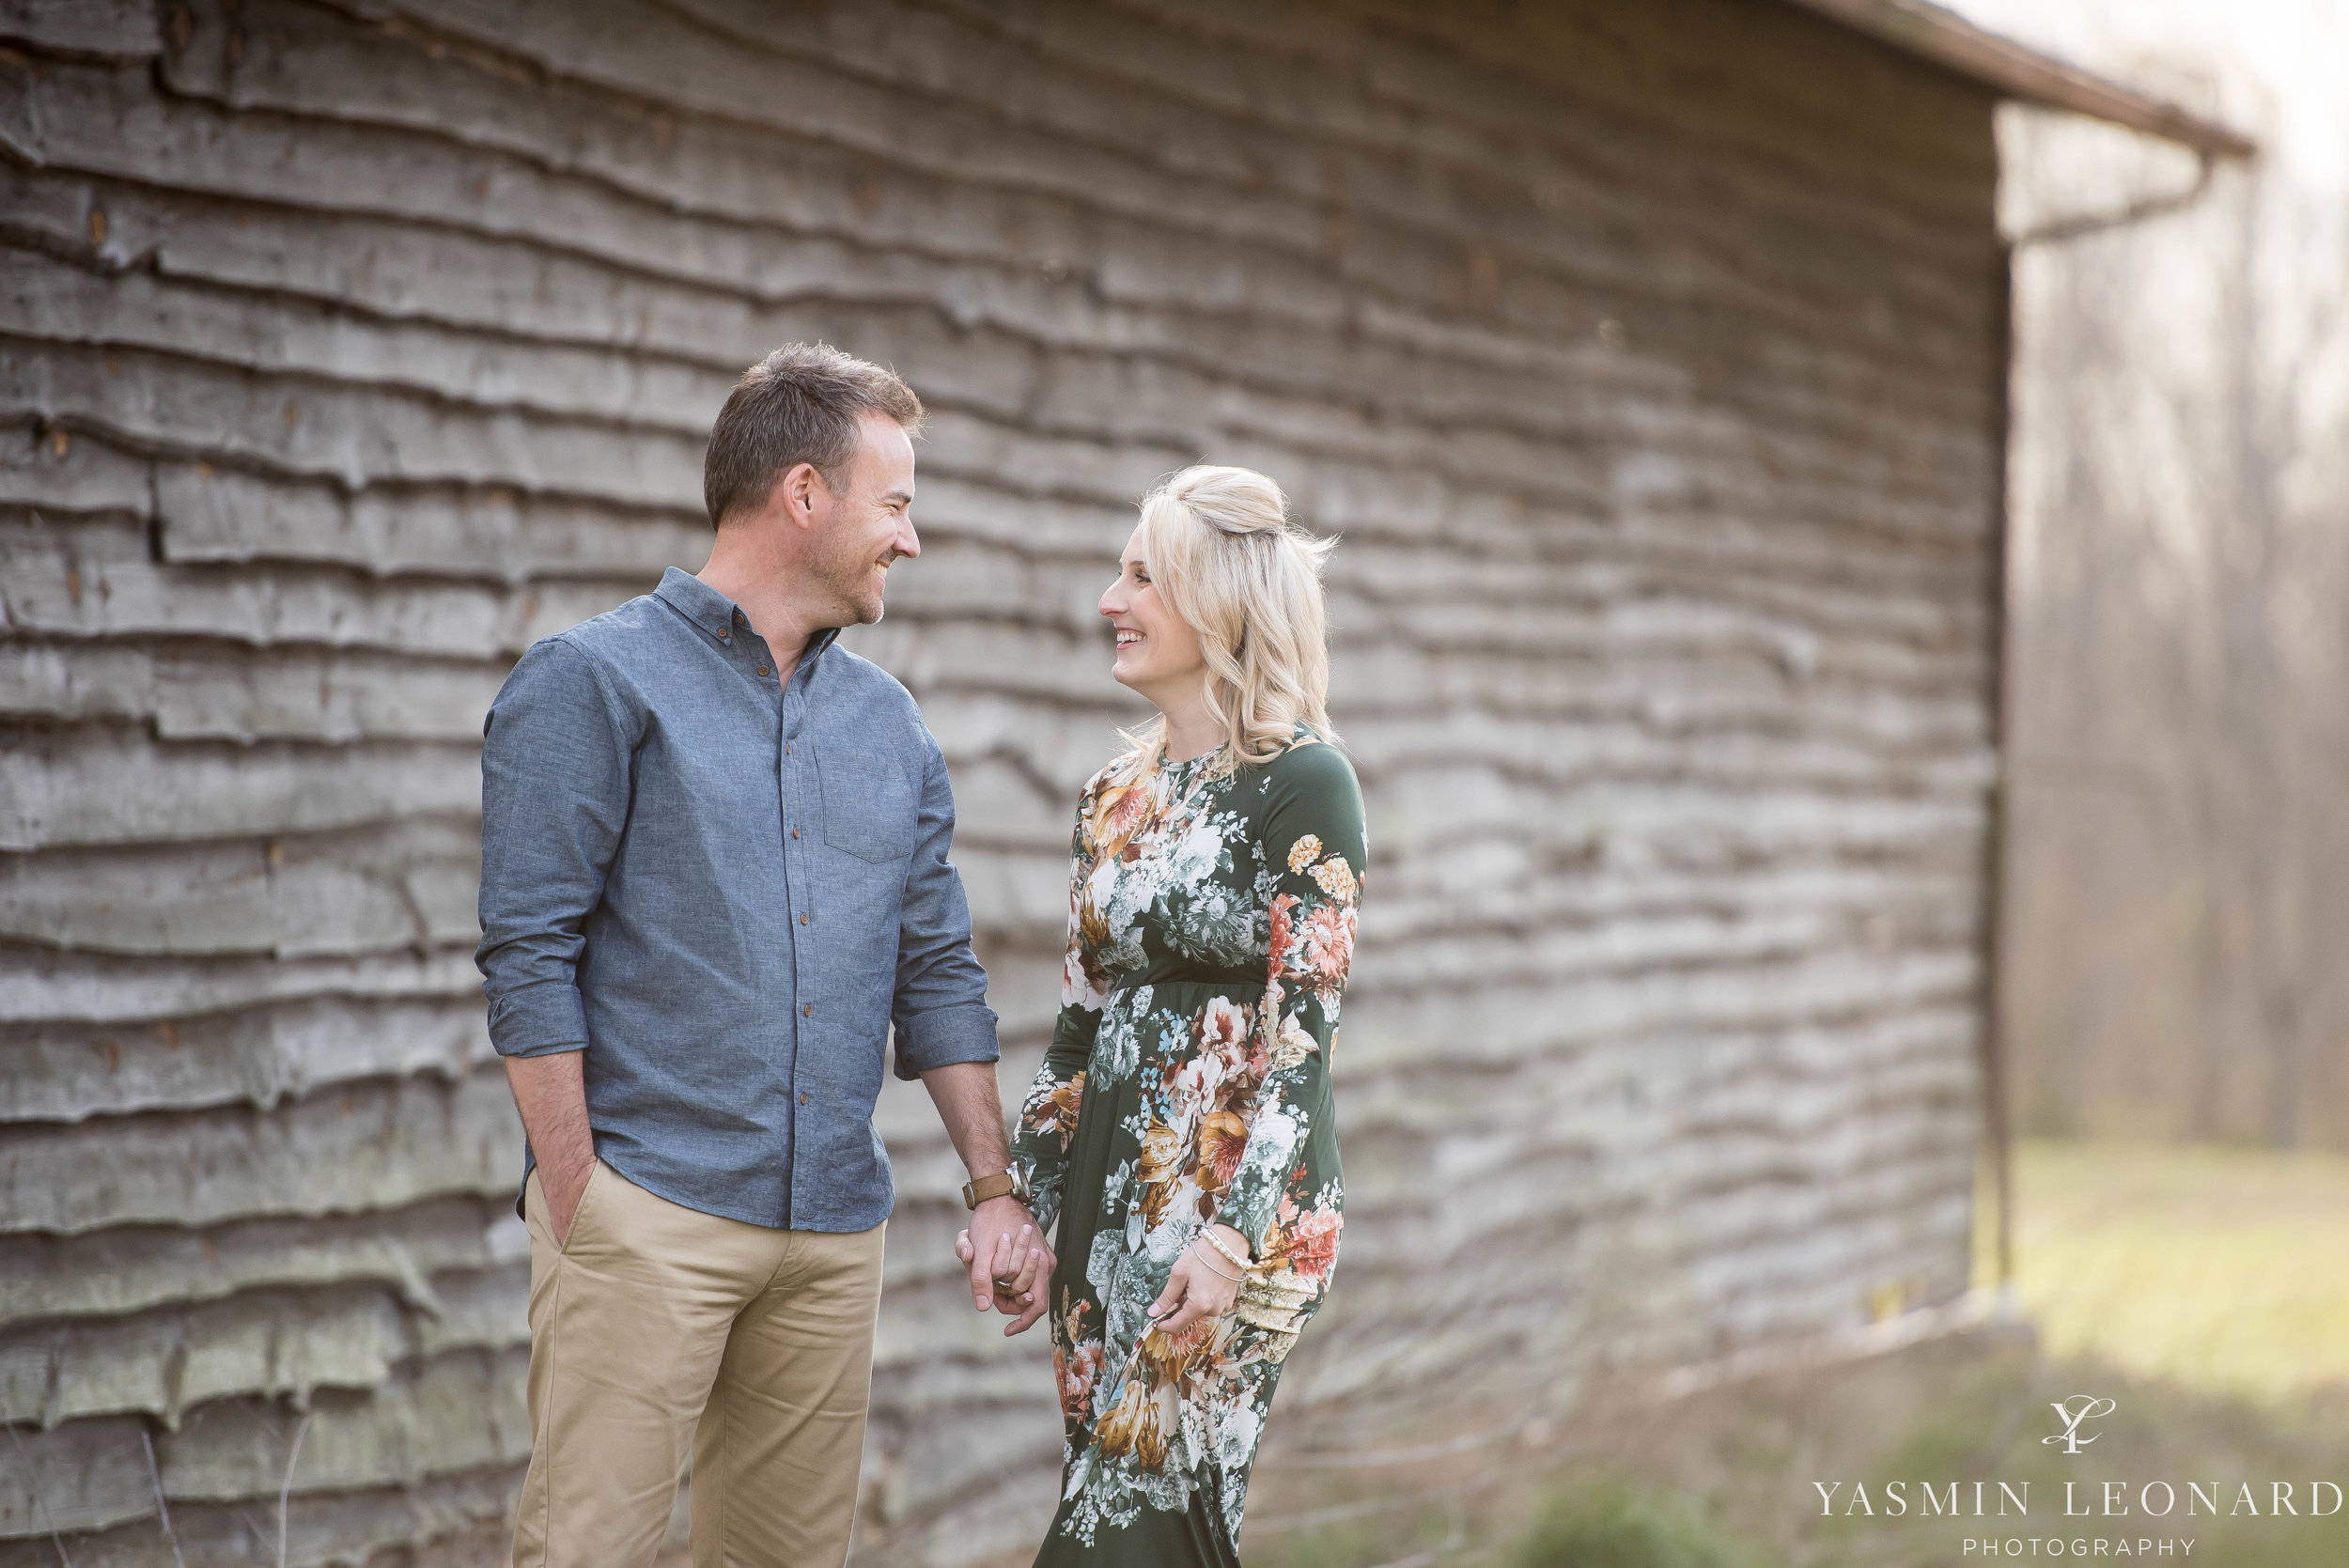 High Point Wedding Photographer - NC Wedding Photographer - Yasmin Leonard Photography - Engagement Poses - Engagement Ideas - Outdoor Engagement Session-18.jpg